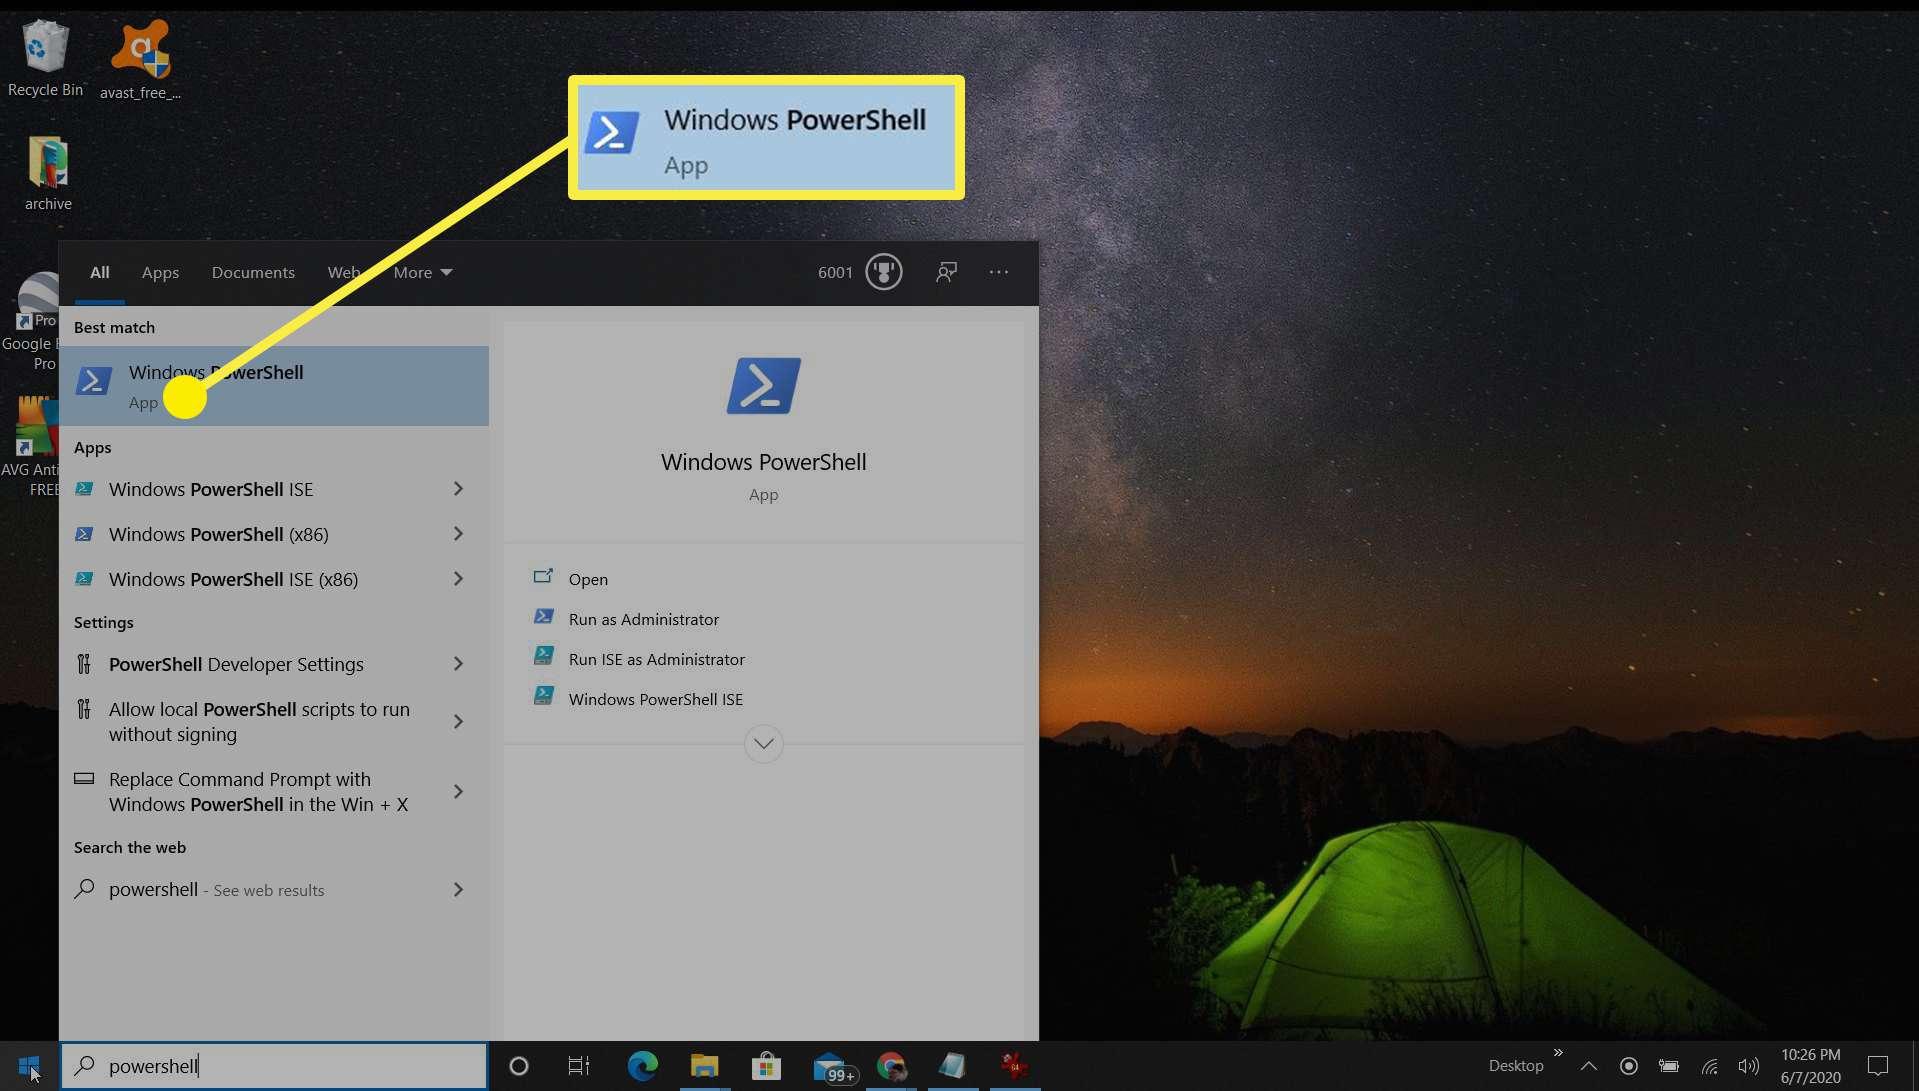 Screenshot of opening PowerShell on Windows 10